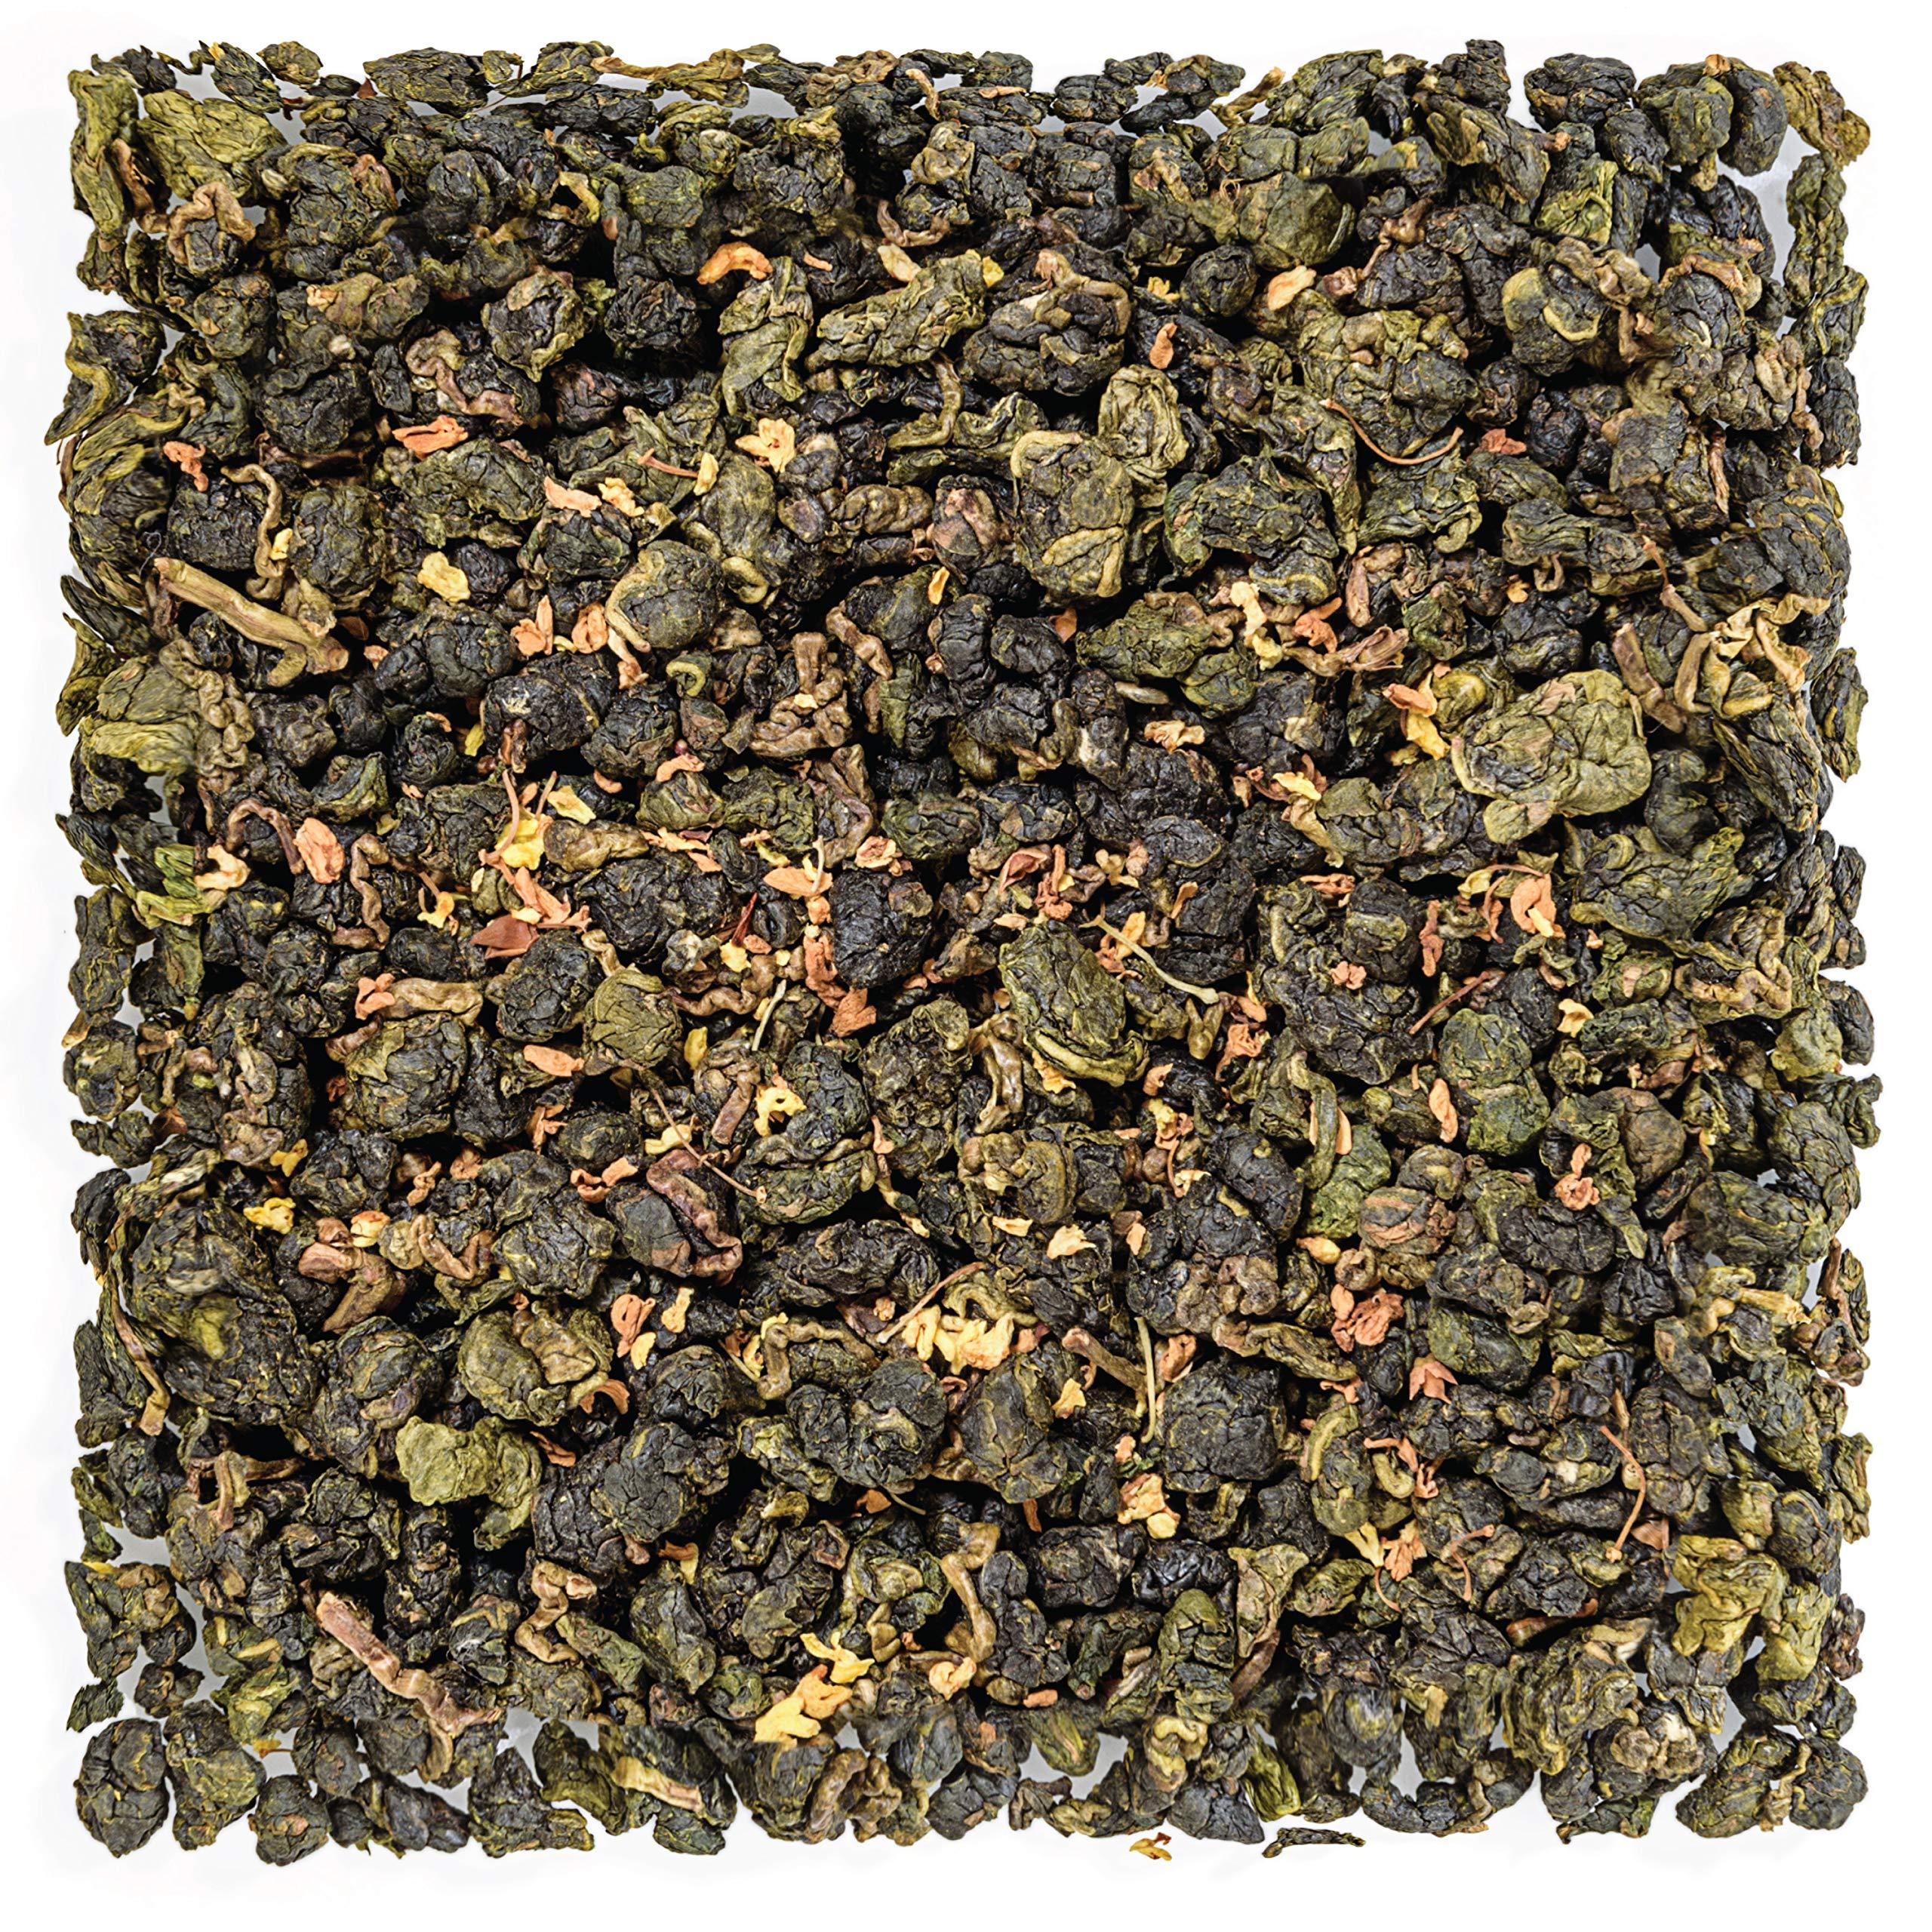 Tealyra - Osmanthus Gui Hua Oolong - Taiwanese Oolong Loose Leafe Tea - Sweet and Aromatic Taste - Organically Produced - 220g (8-ounce)